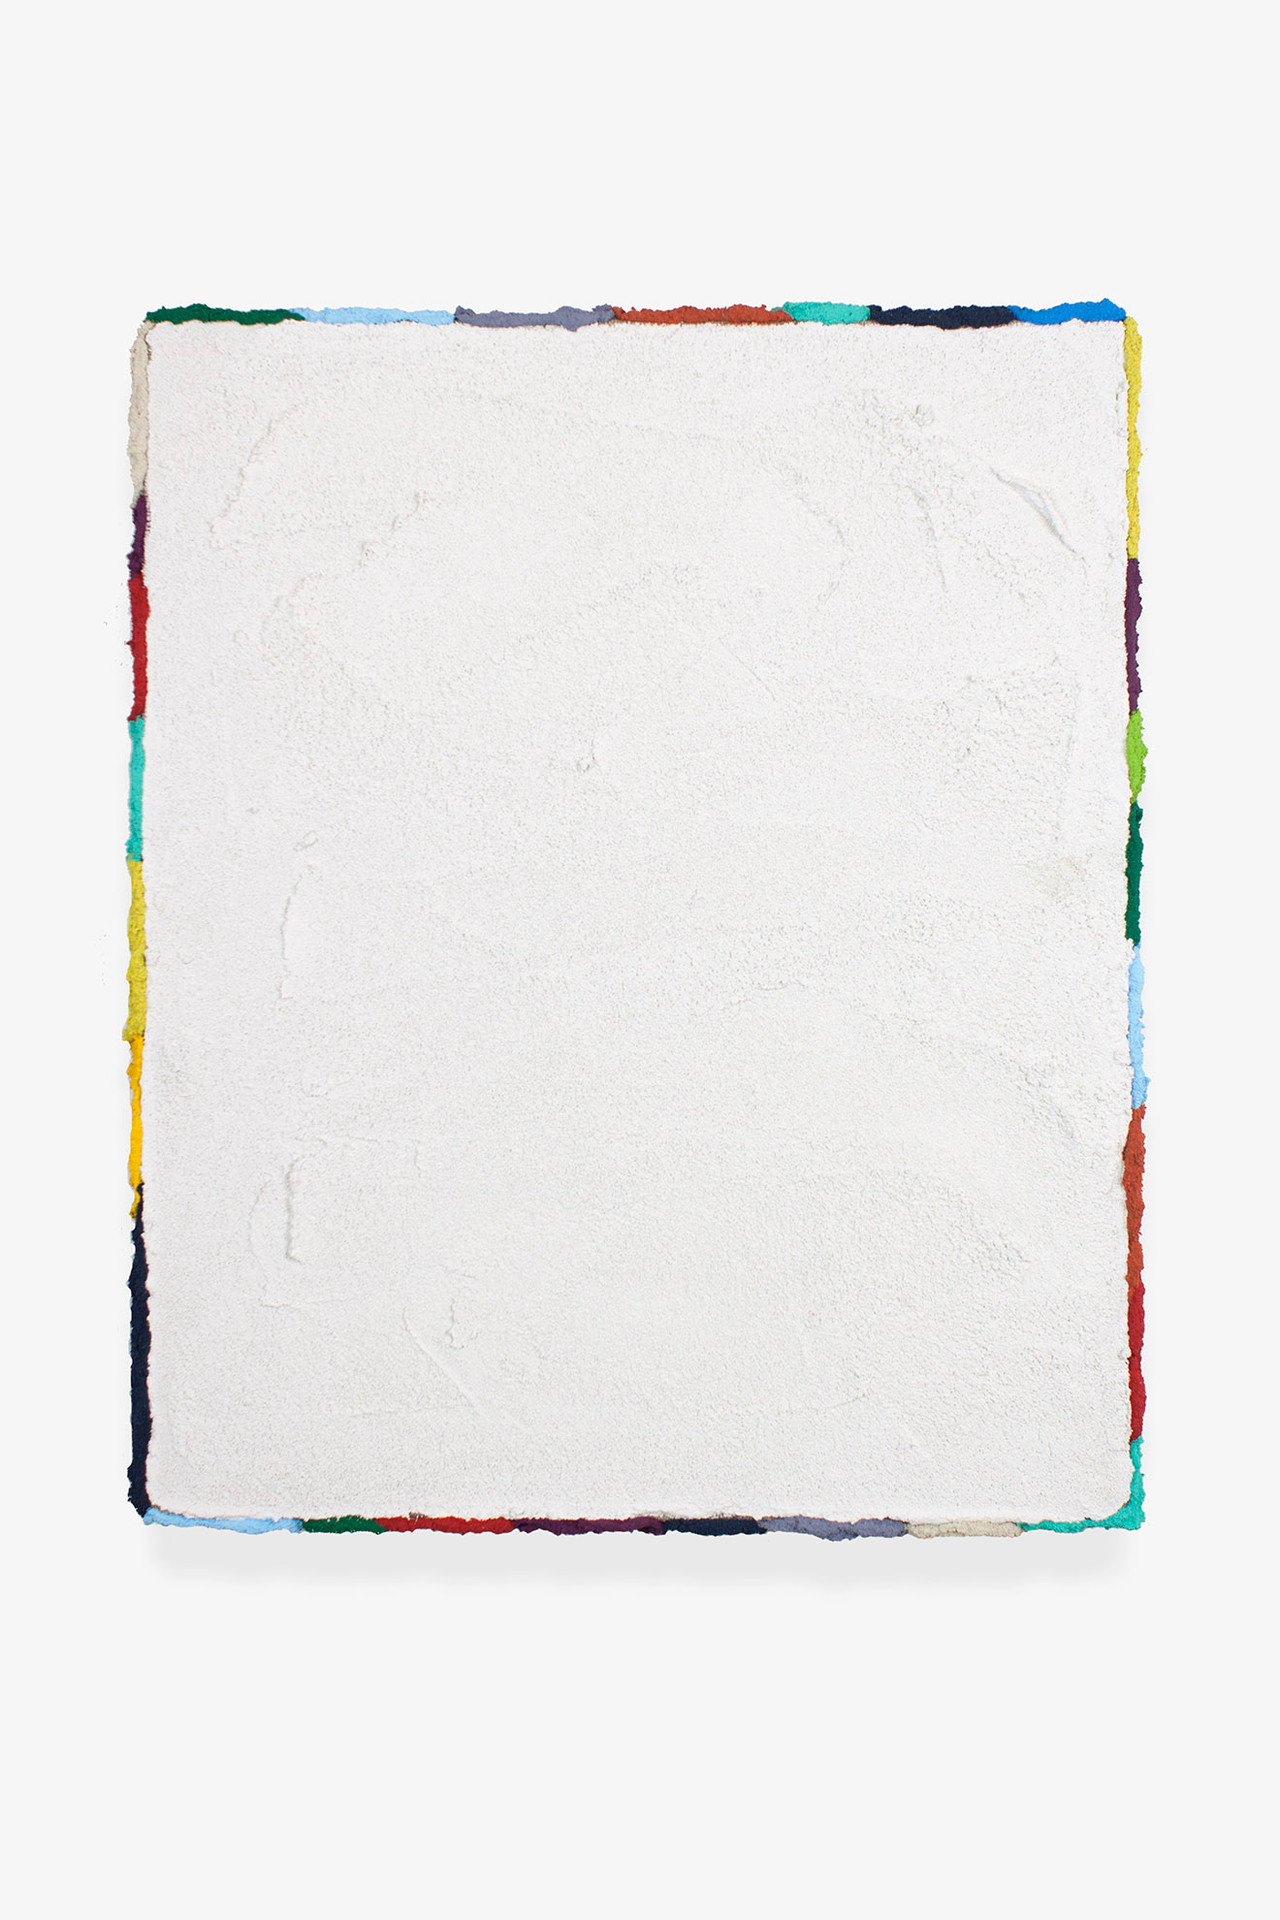 Pintura JL02, 2019. Acrylic, sand and limestone on linen. 47 x 39 cm.